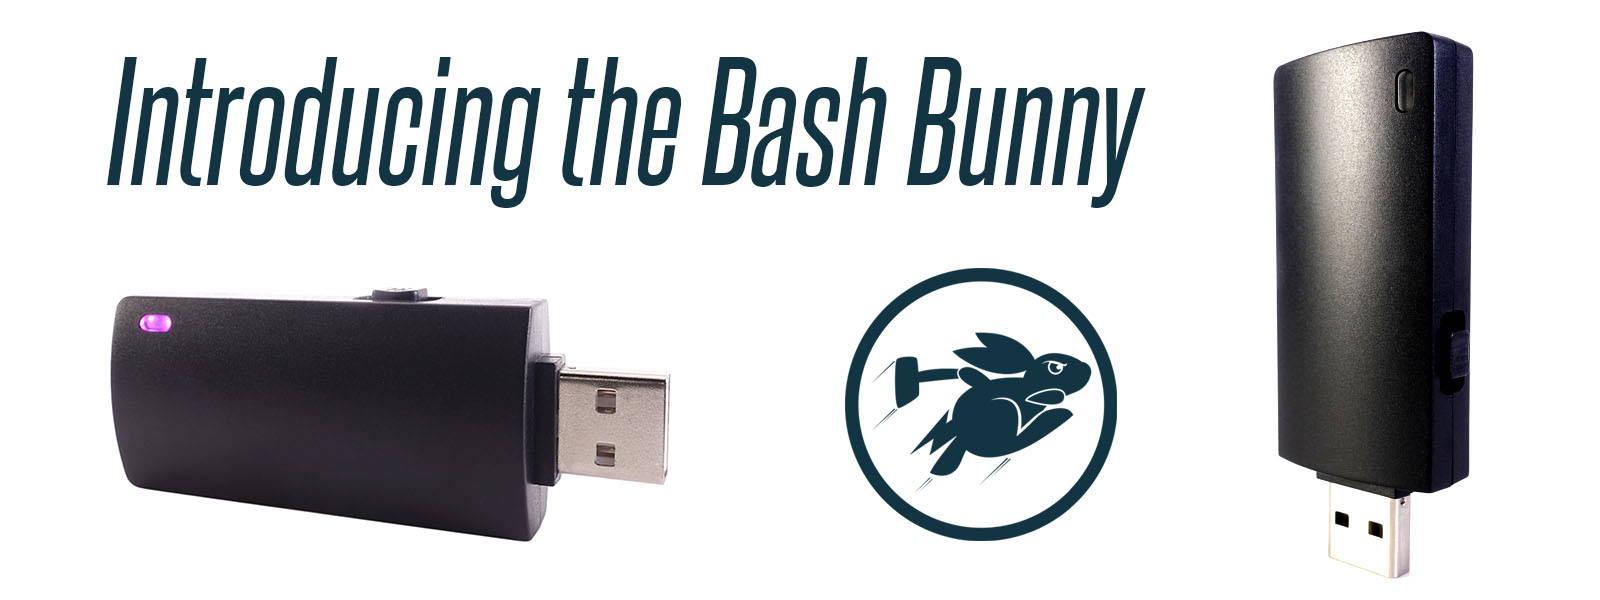 flash link updater купить в самаре